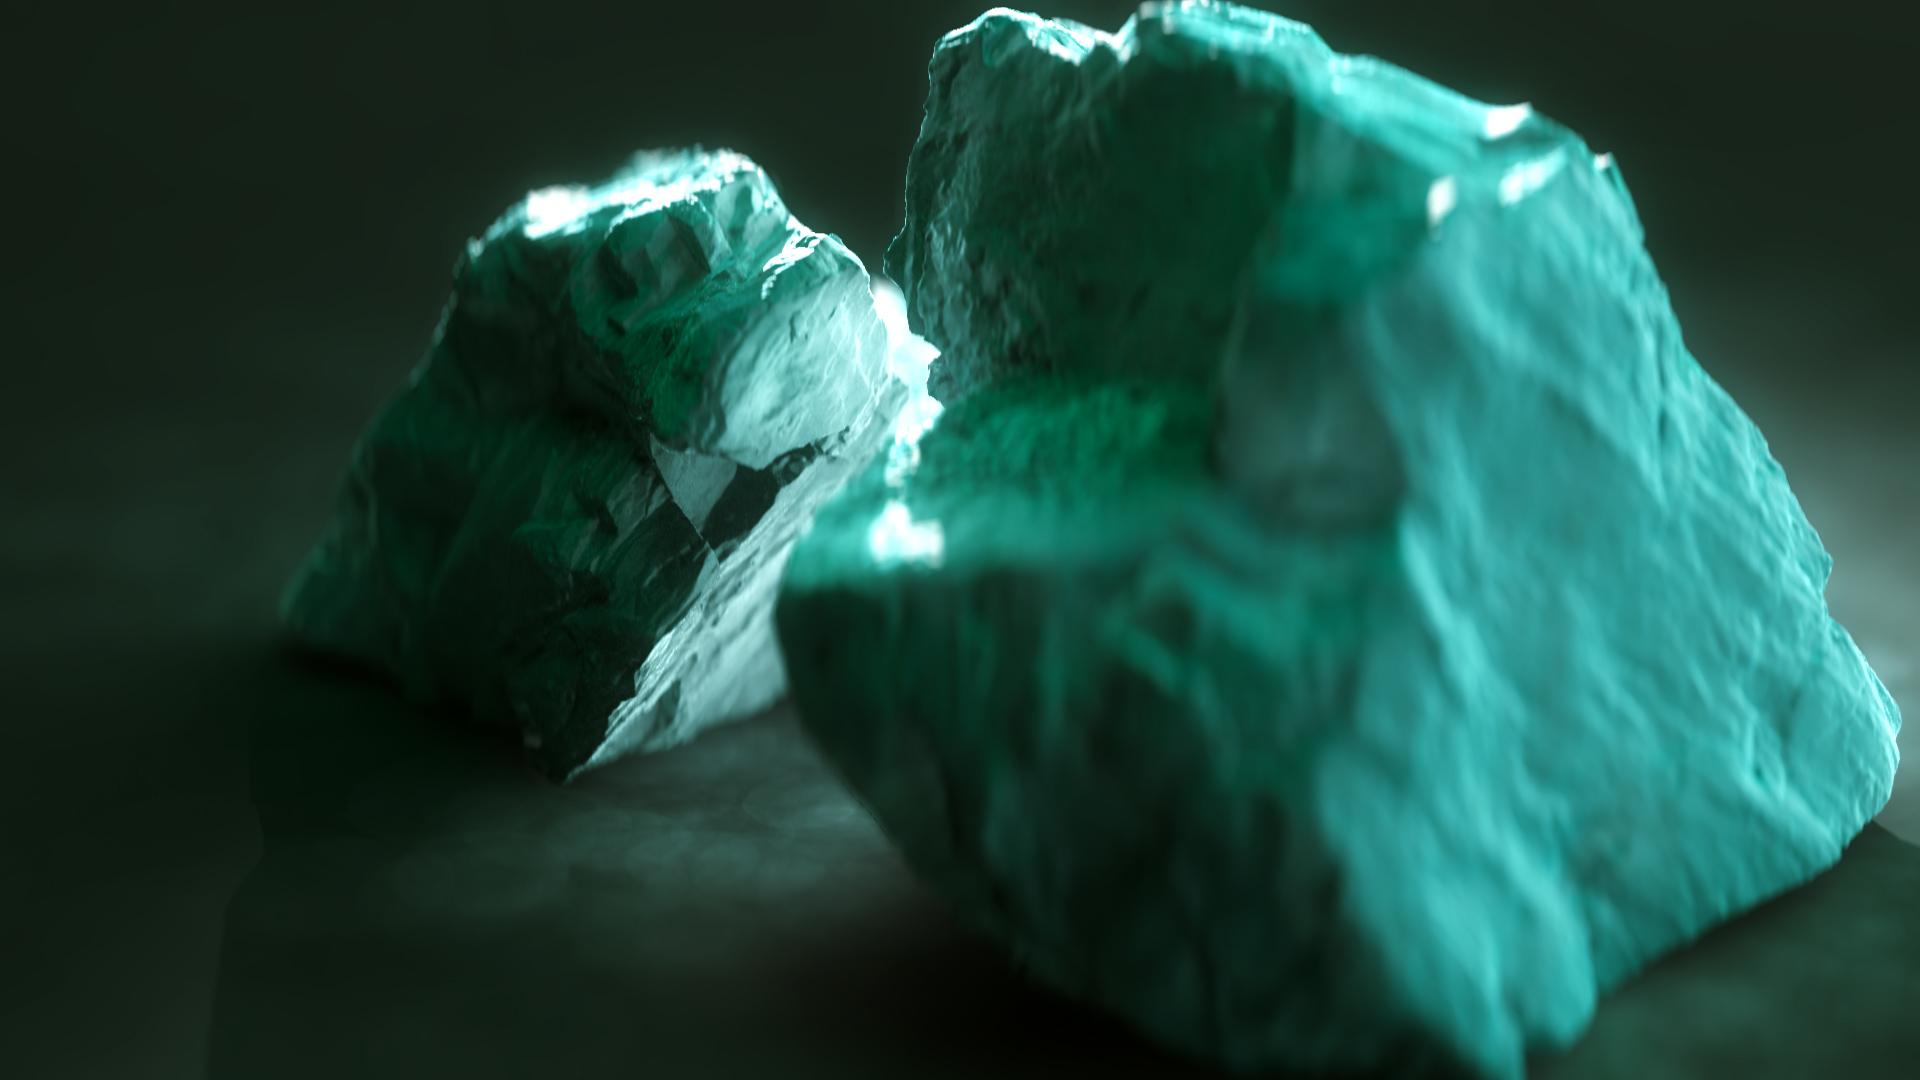 cristal_00001.jpg